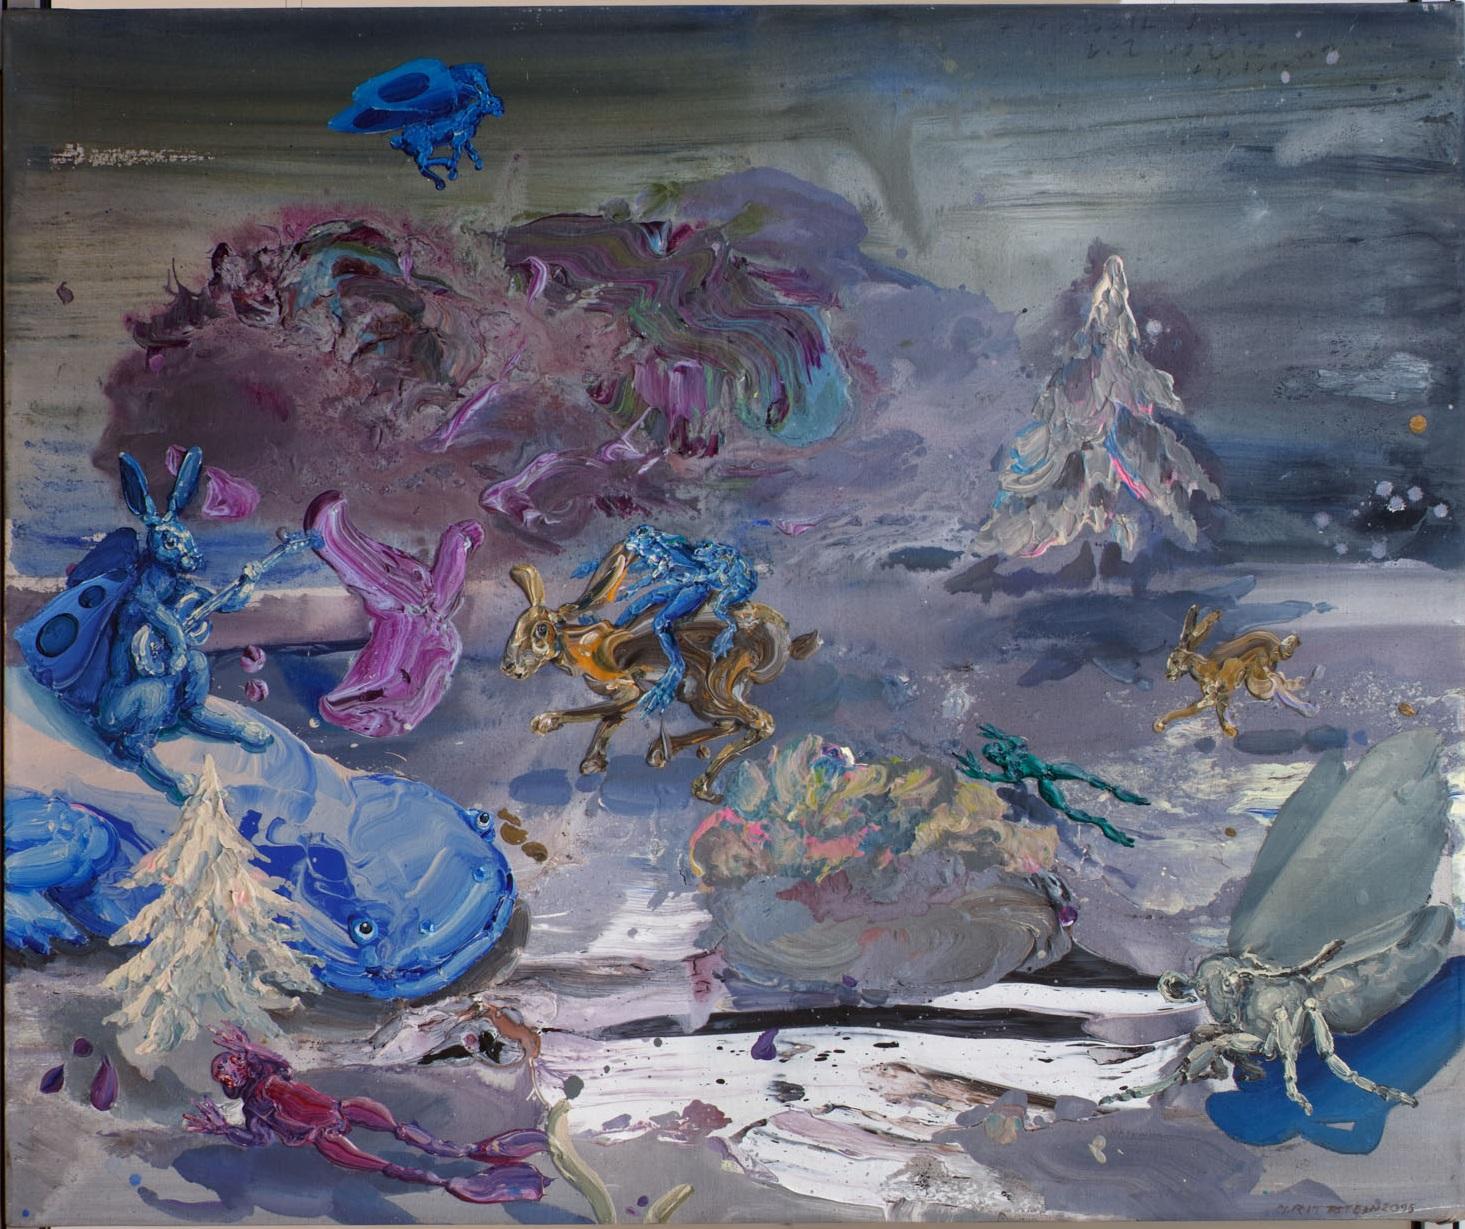 Michael Rittstein, Podvečer, 2015, plátno, akryl, 150 x 180 cm